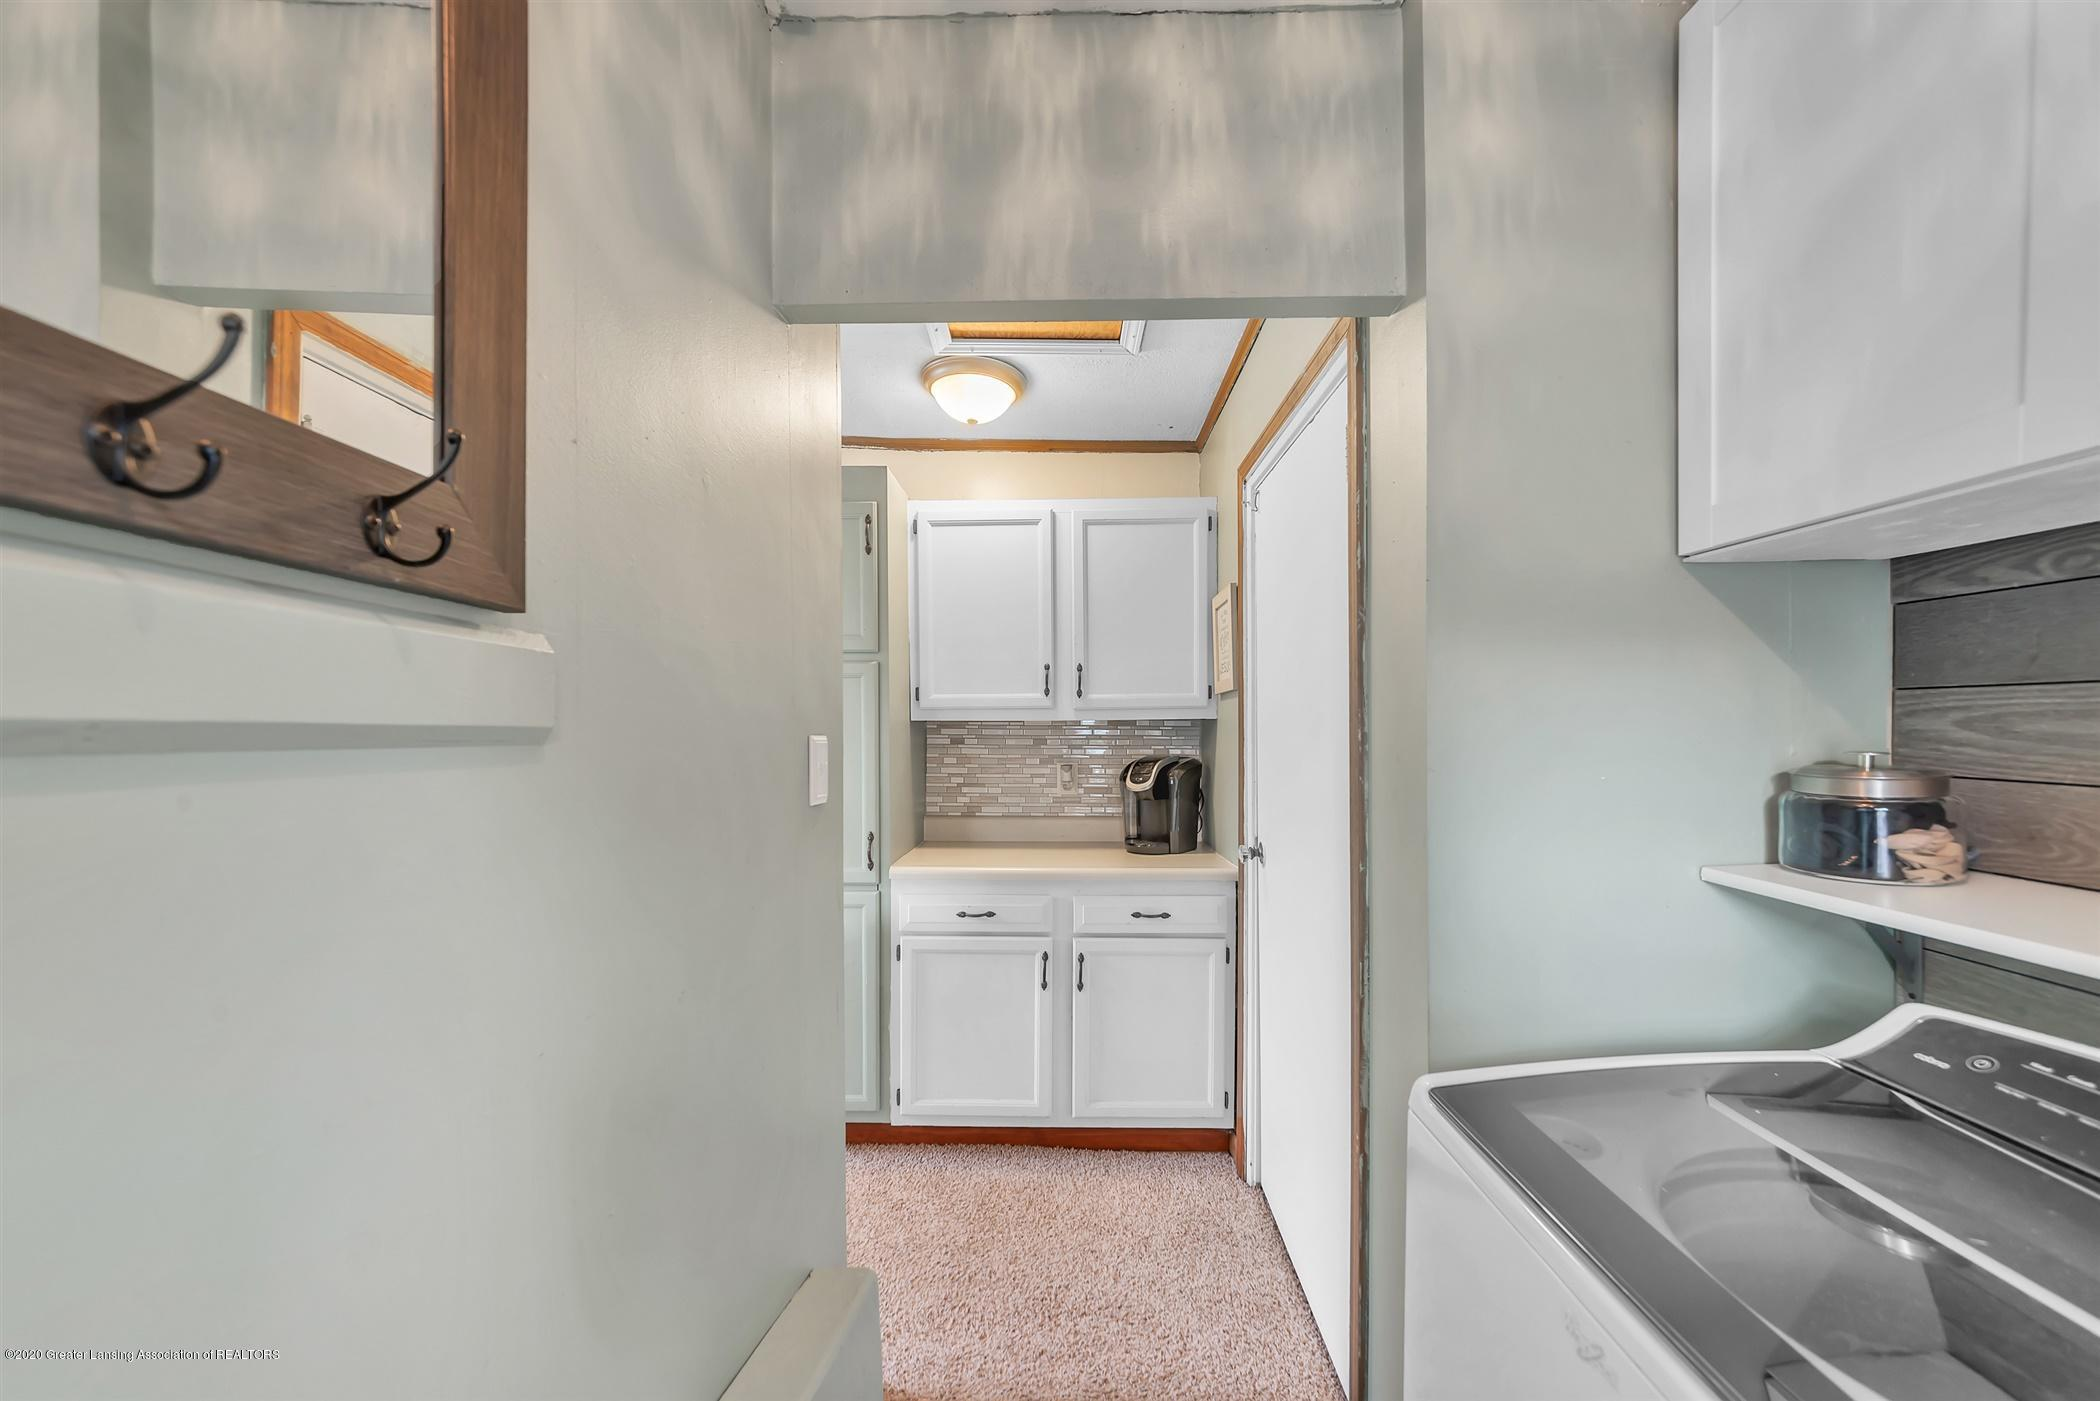 2029 Phillips Ave - 12-2029 Phillips Avenue-WindowStill - 13